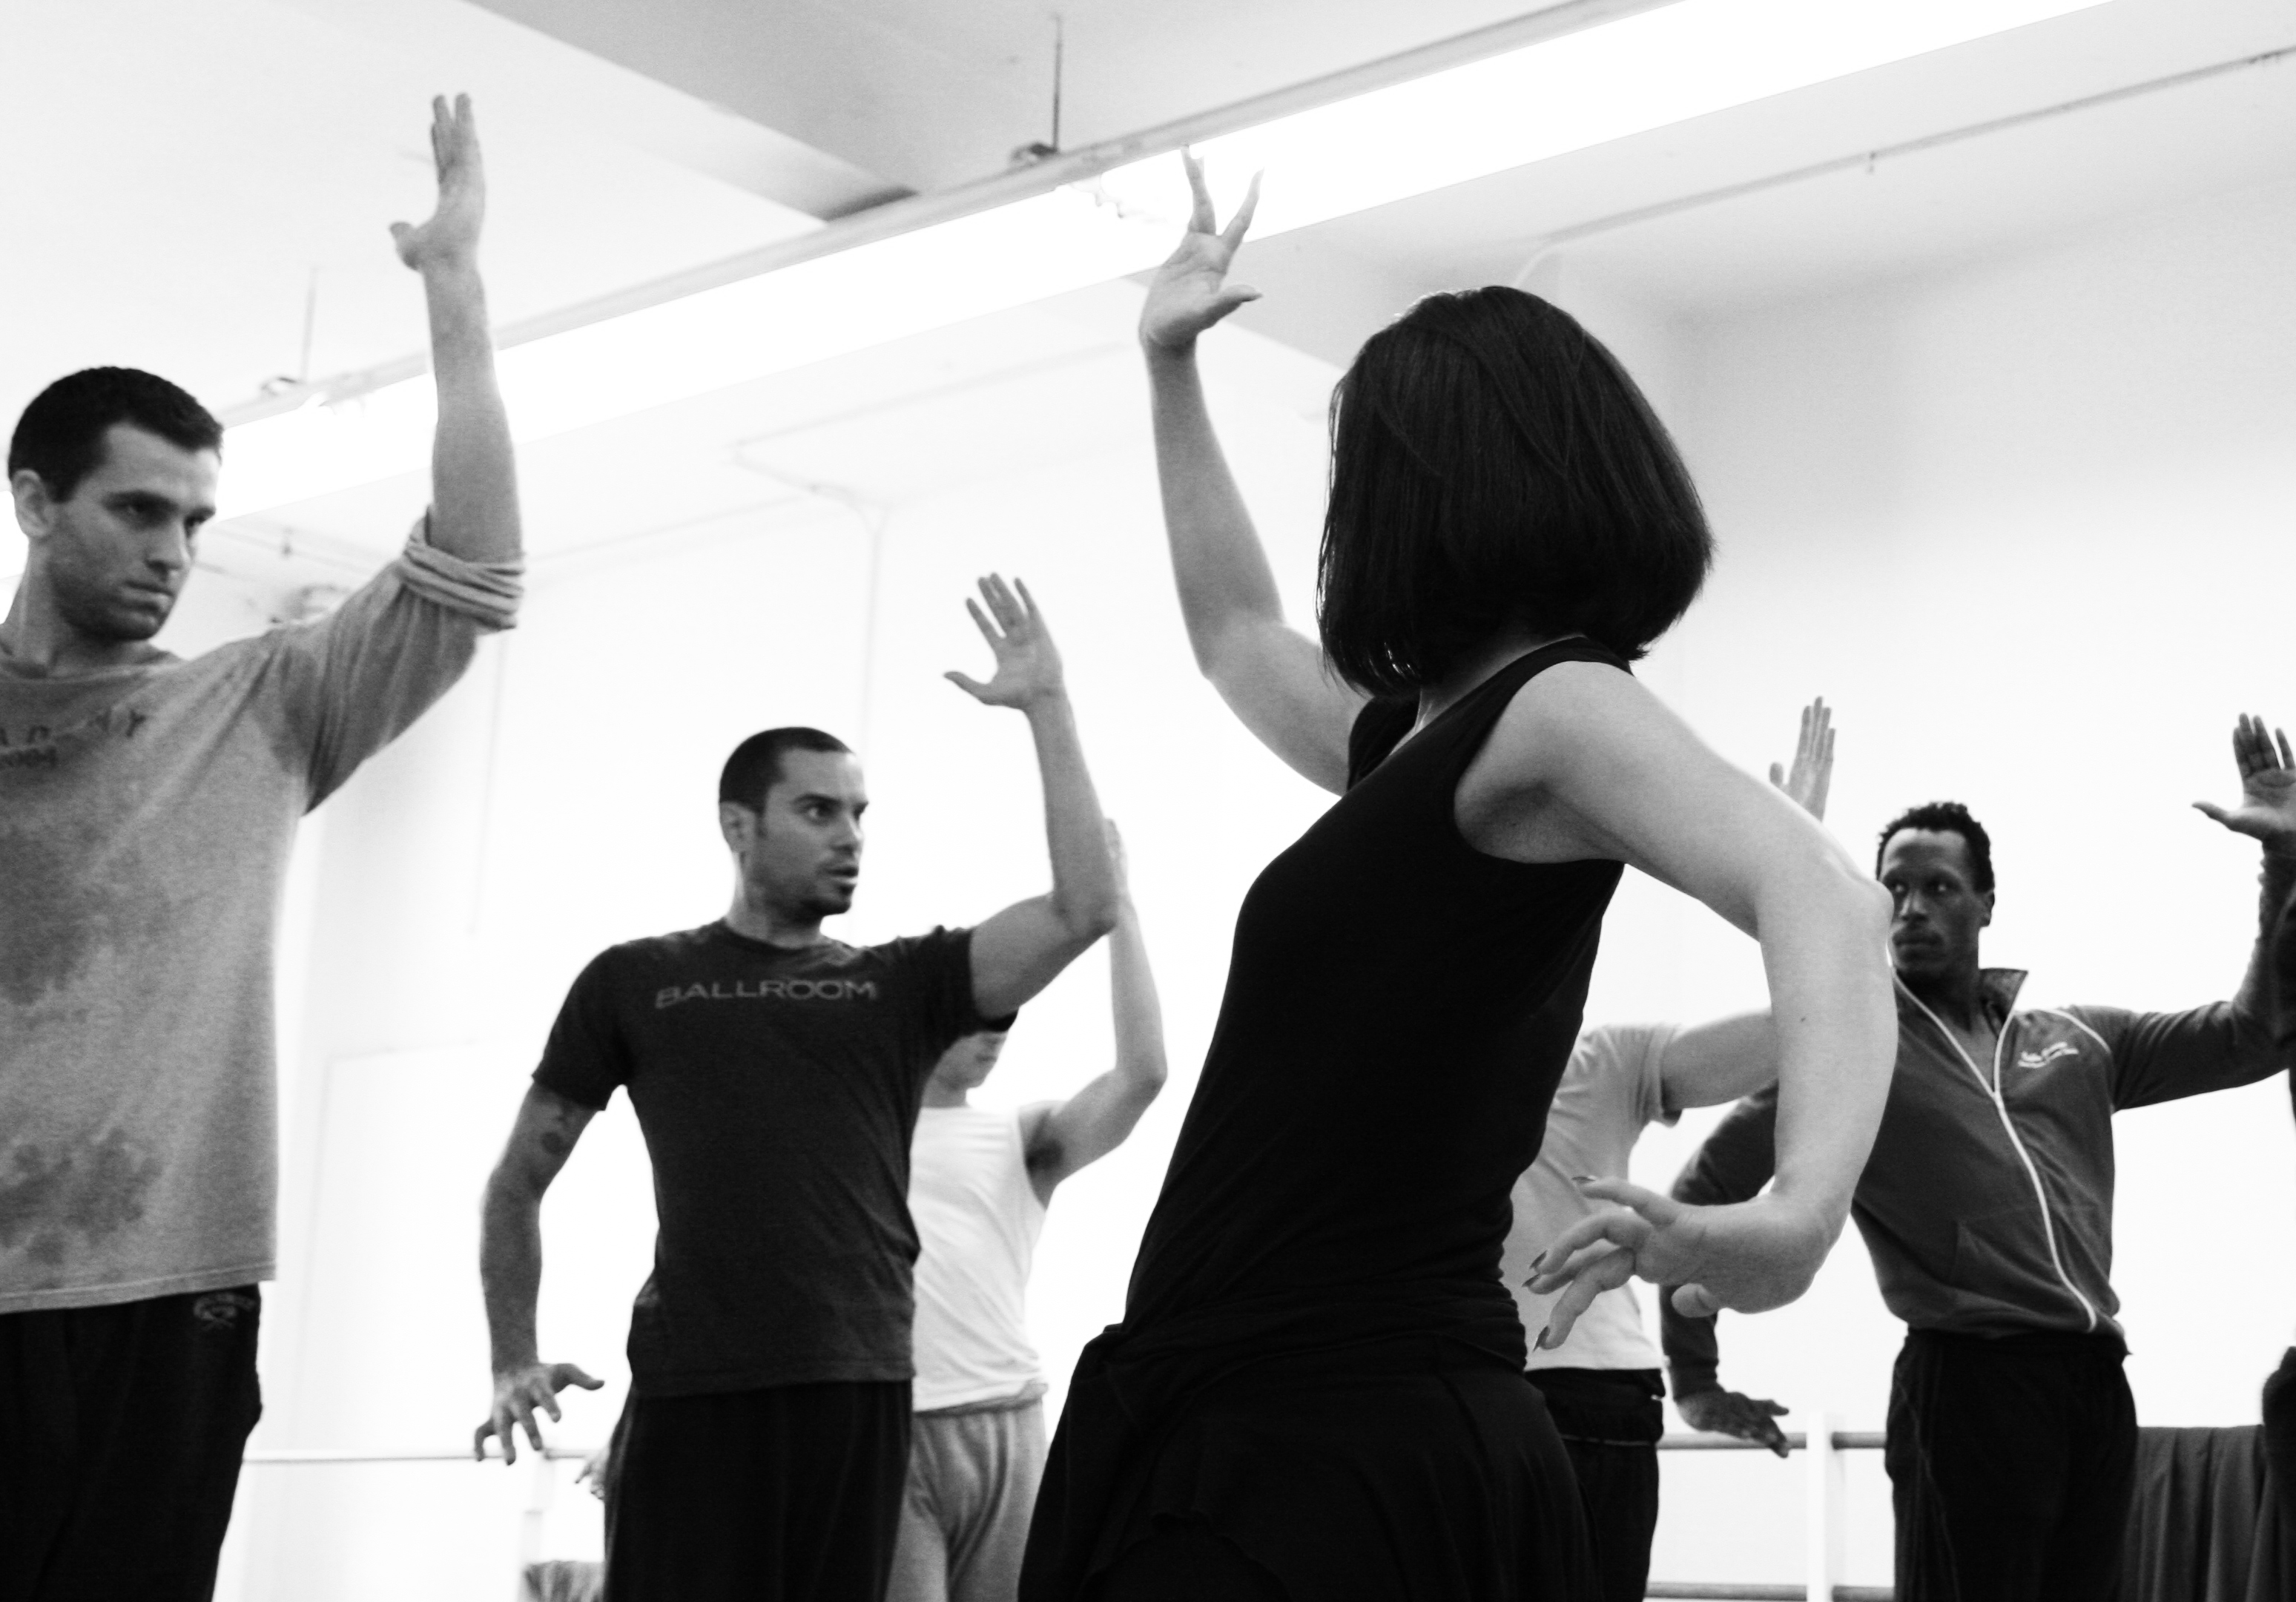 JP Tenuta, Ricardo J. Garcia, Annabelle Lopez Ochoa and Bobby Briscoe rehearsing Nube Blanco.  Photo by Altin Kaftira.